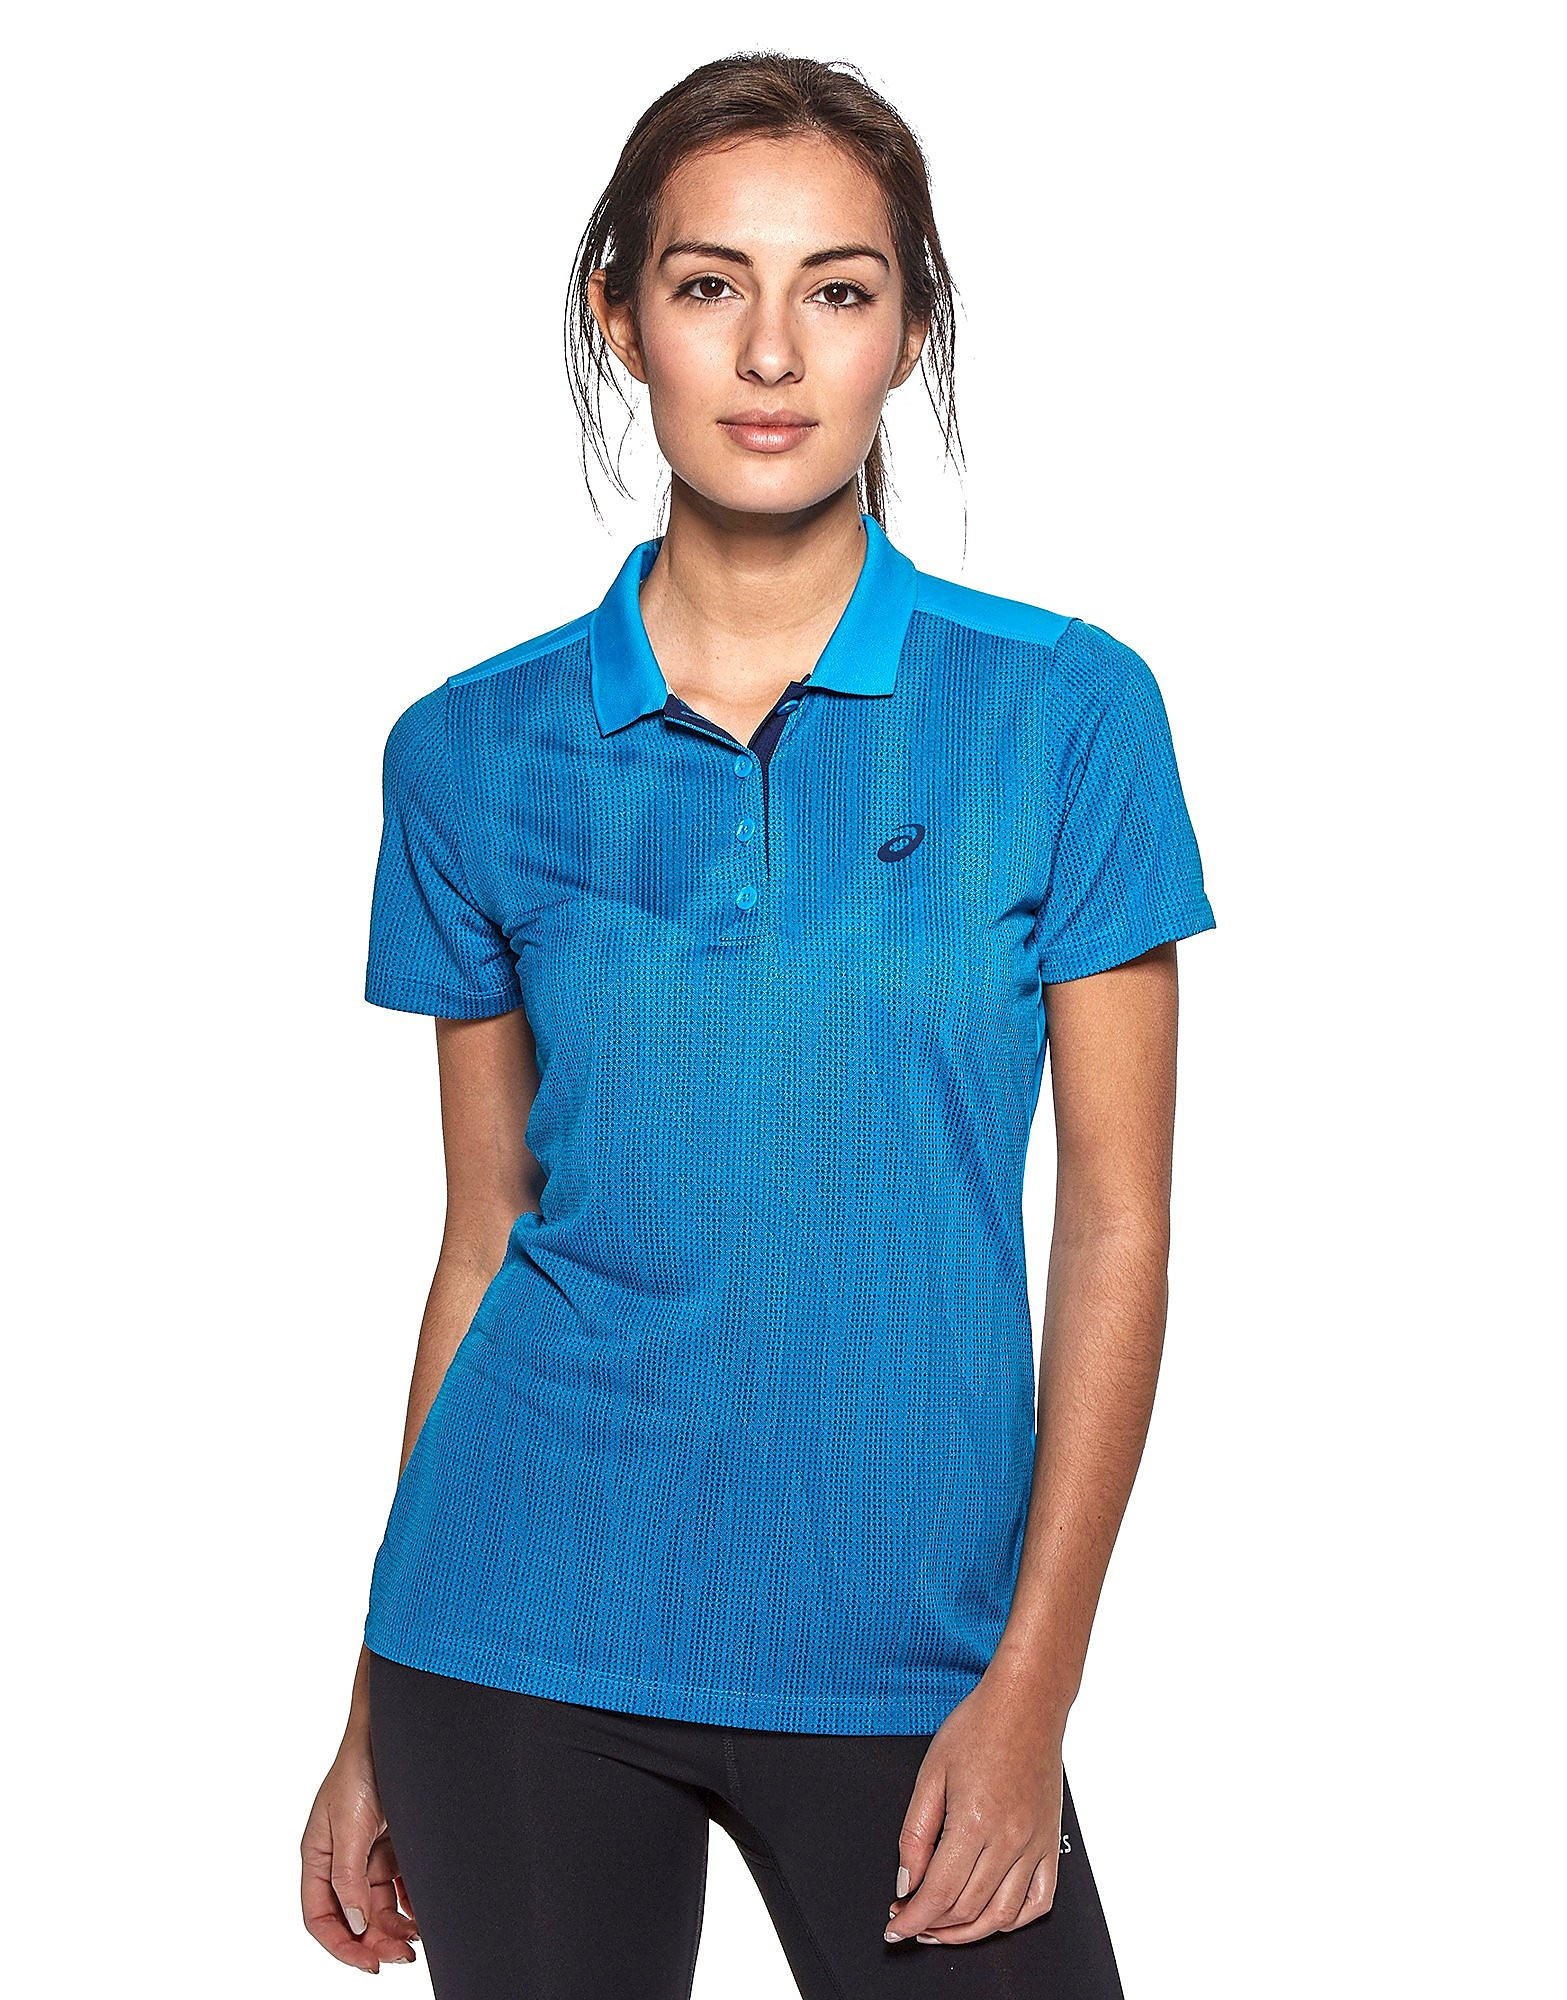 ASICS Club Tennis Polo Shirt